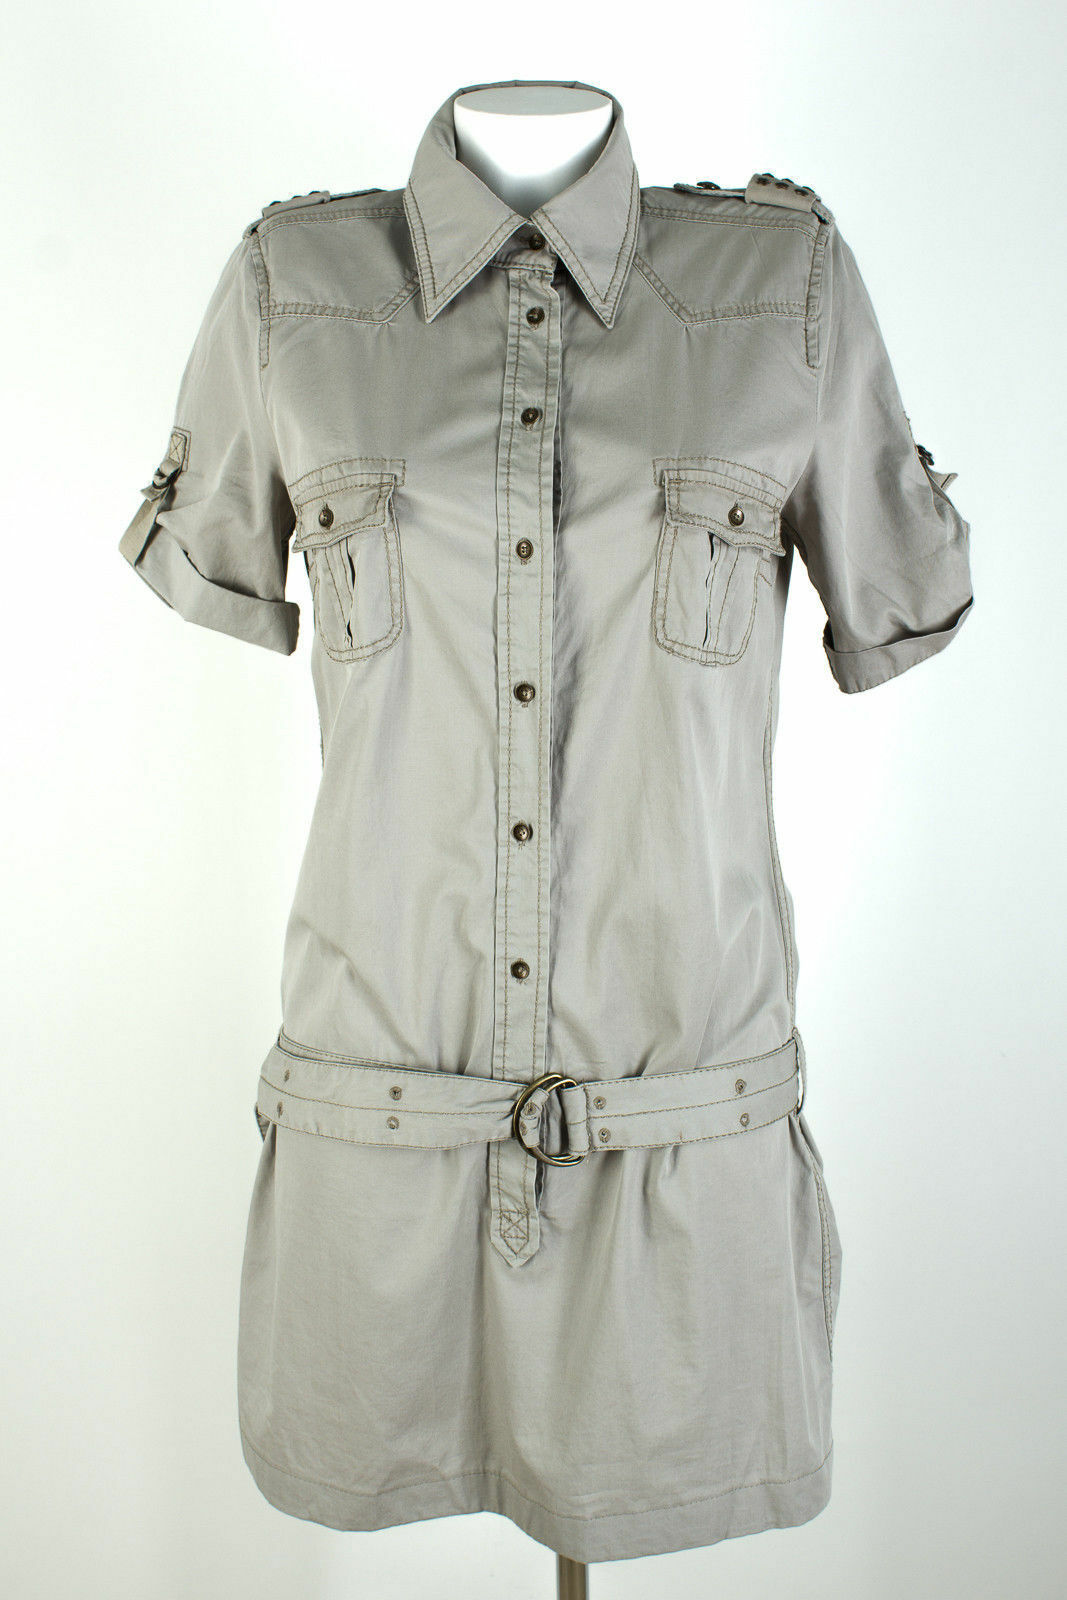 Drykorn for beautiful people Hemdkleid Gr. 4   DE 36 Baumwolle Sommer Mini Kleid